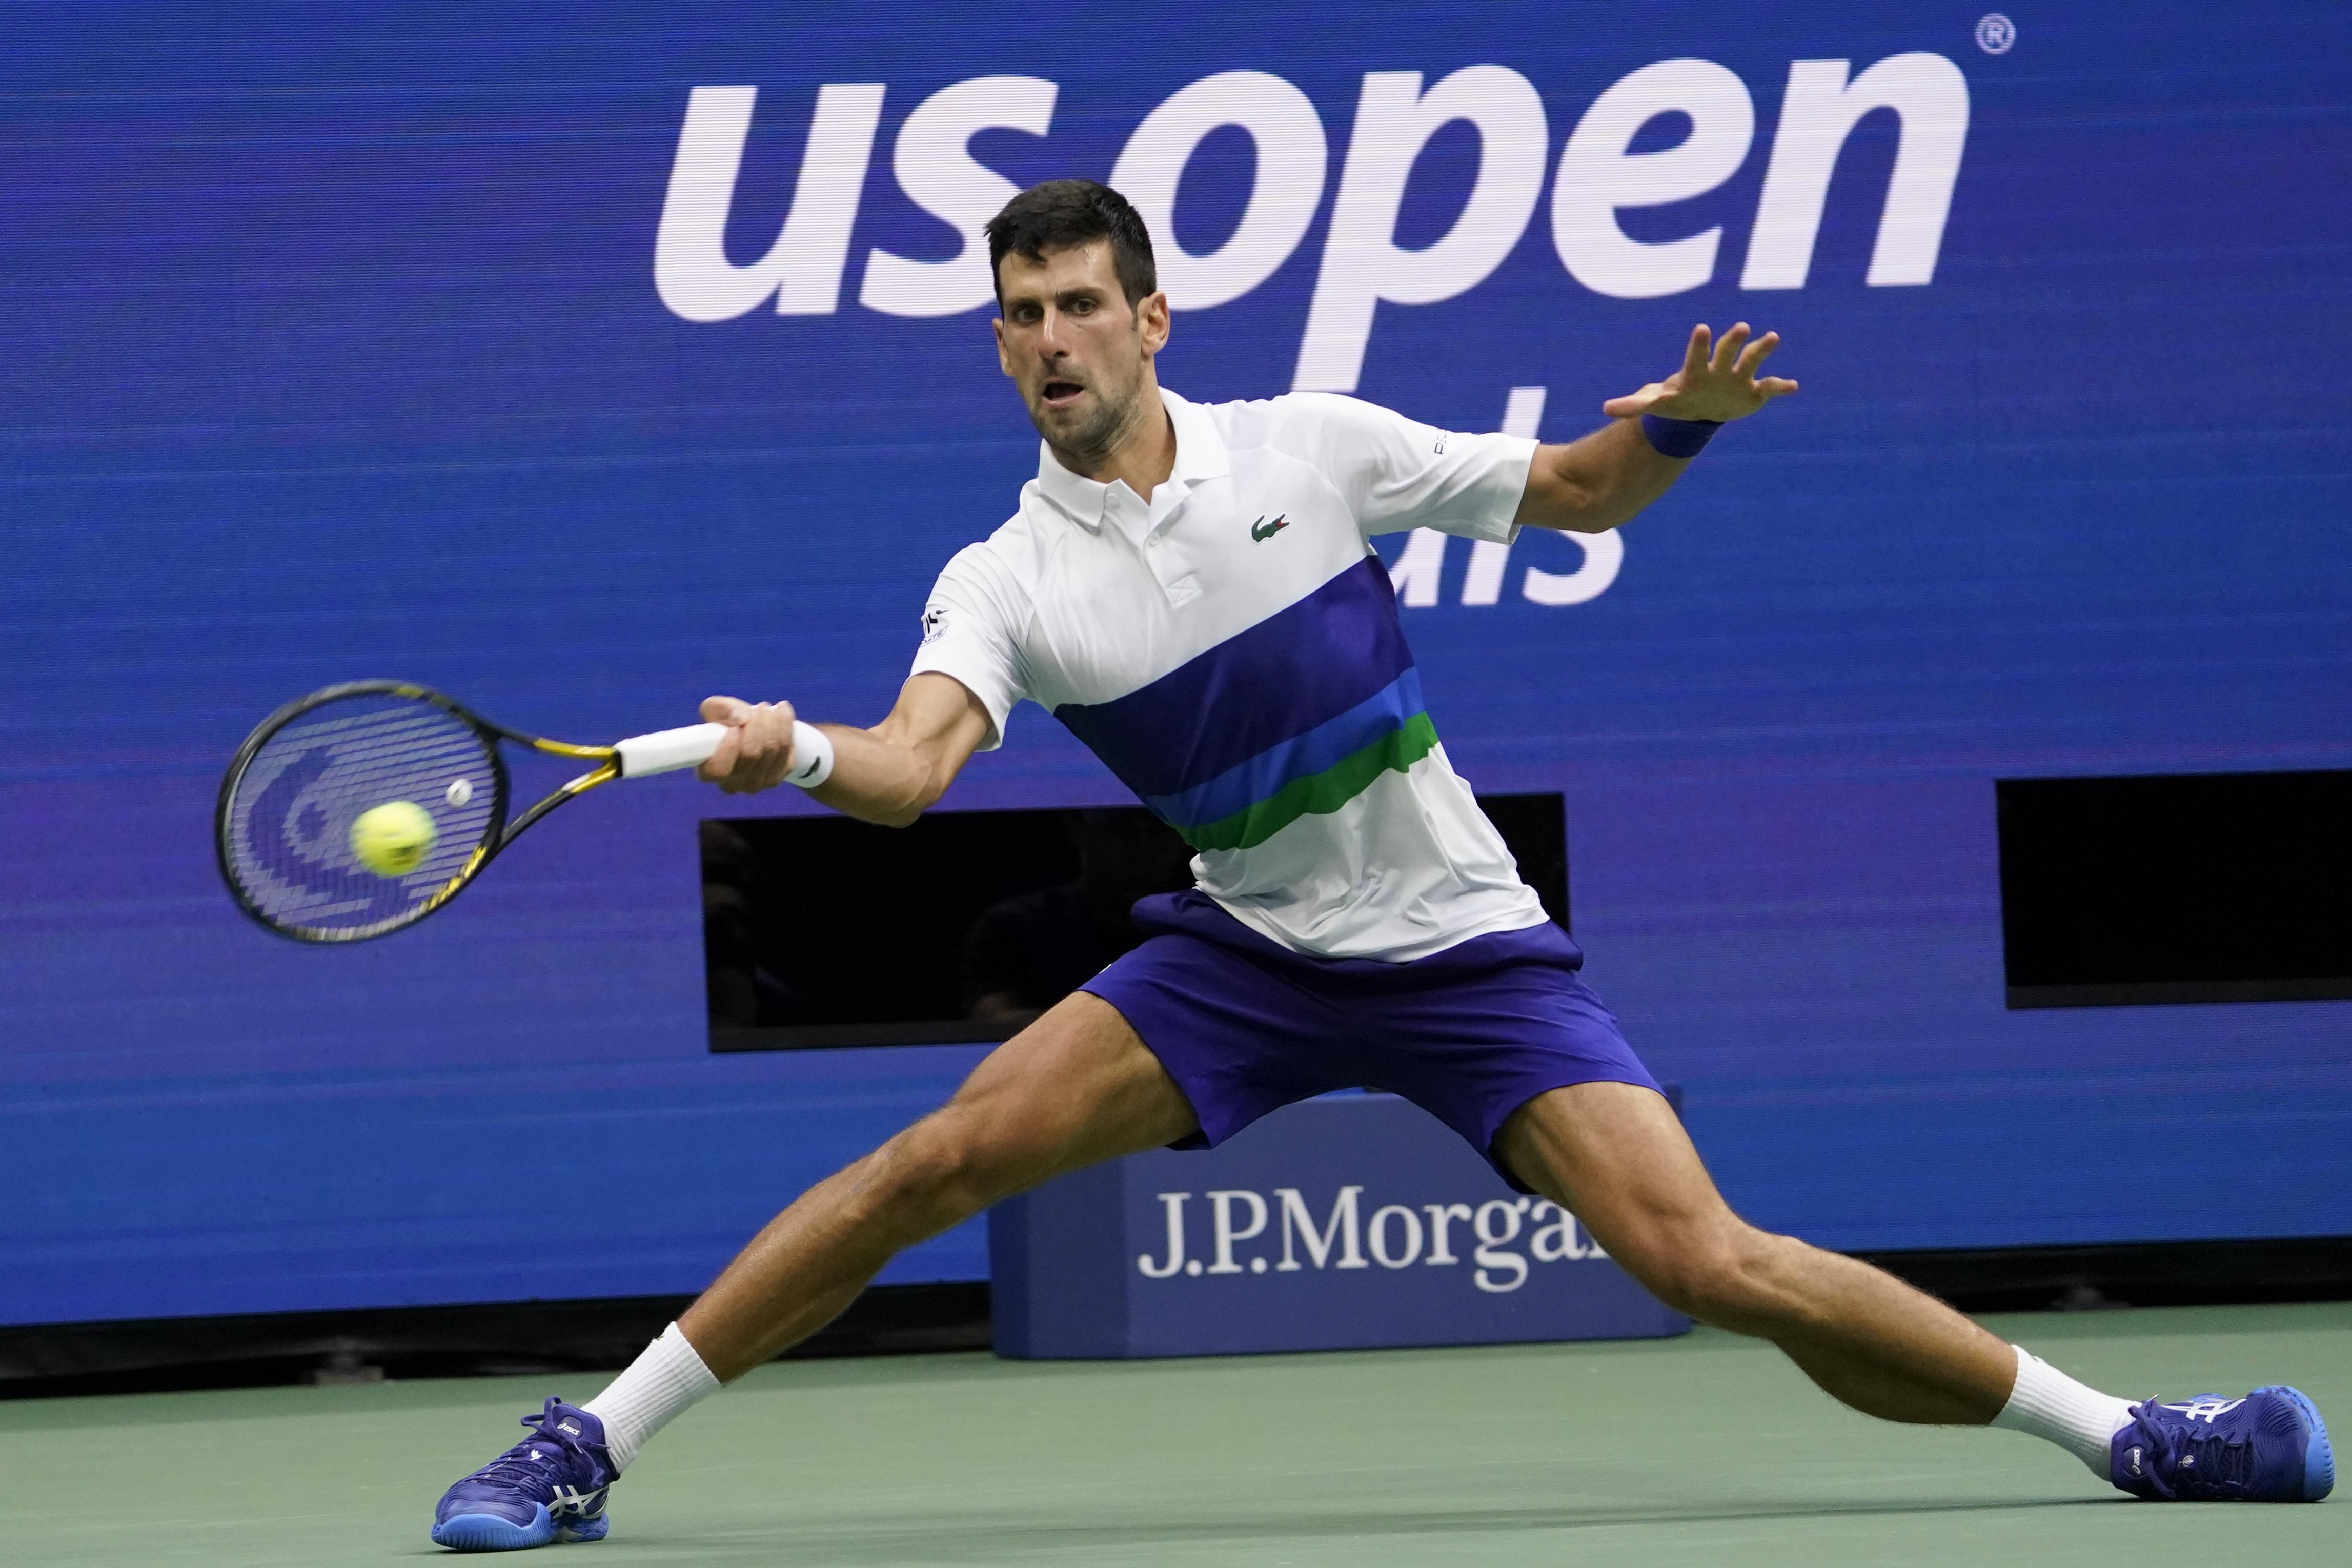 World No. 1 Novak Djokovic Withdraws from 2021 BNP Paribas Open   Bleacher  Report   Latest News, Videos and Highlights